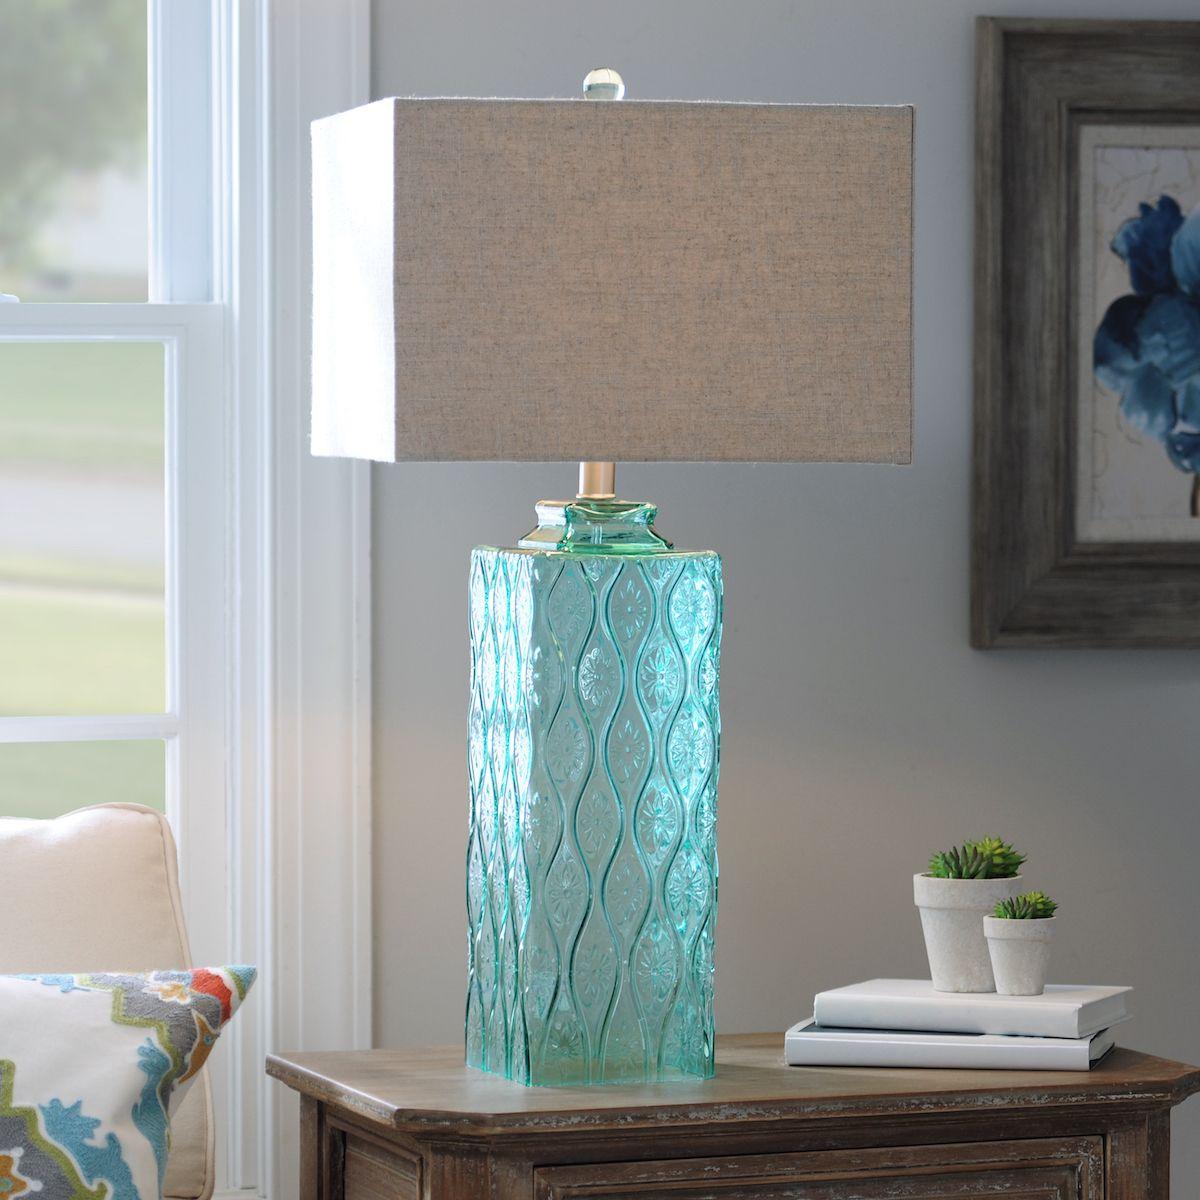 Blue glass table lamps  Embossed Aqua Glass Table Lamp  Aqua glass Glass table lamps and